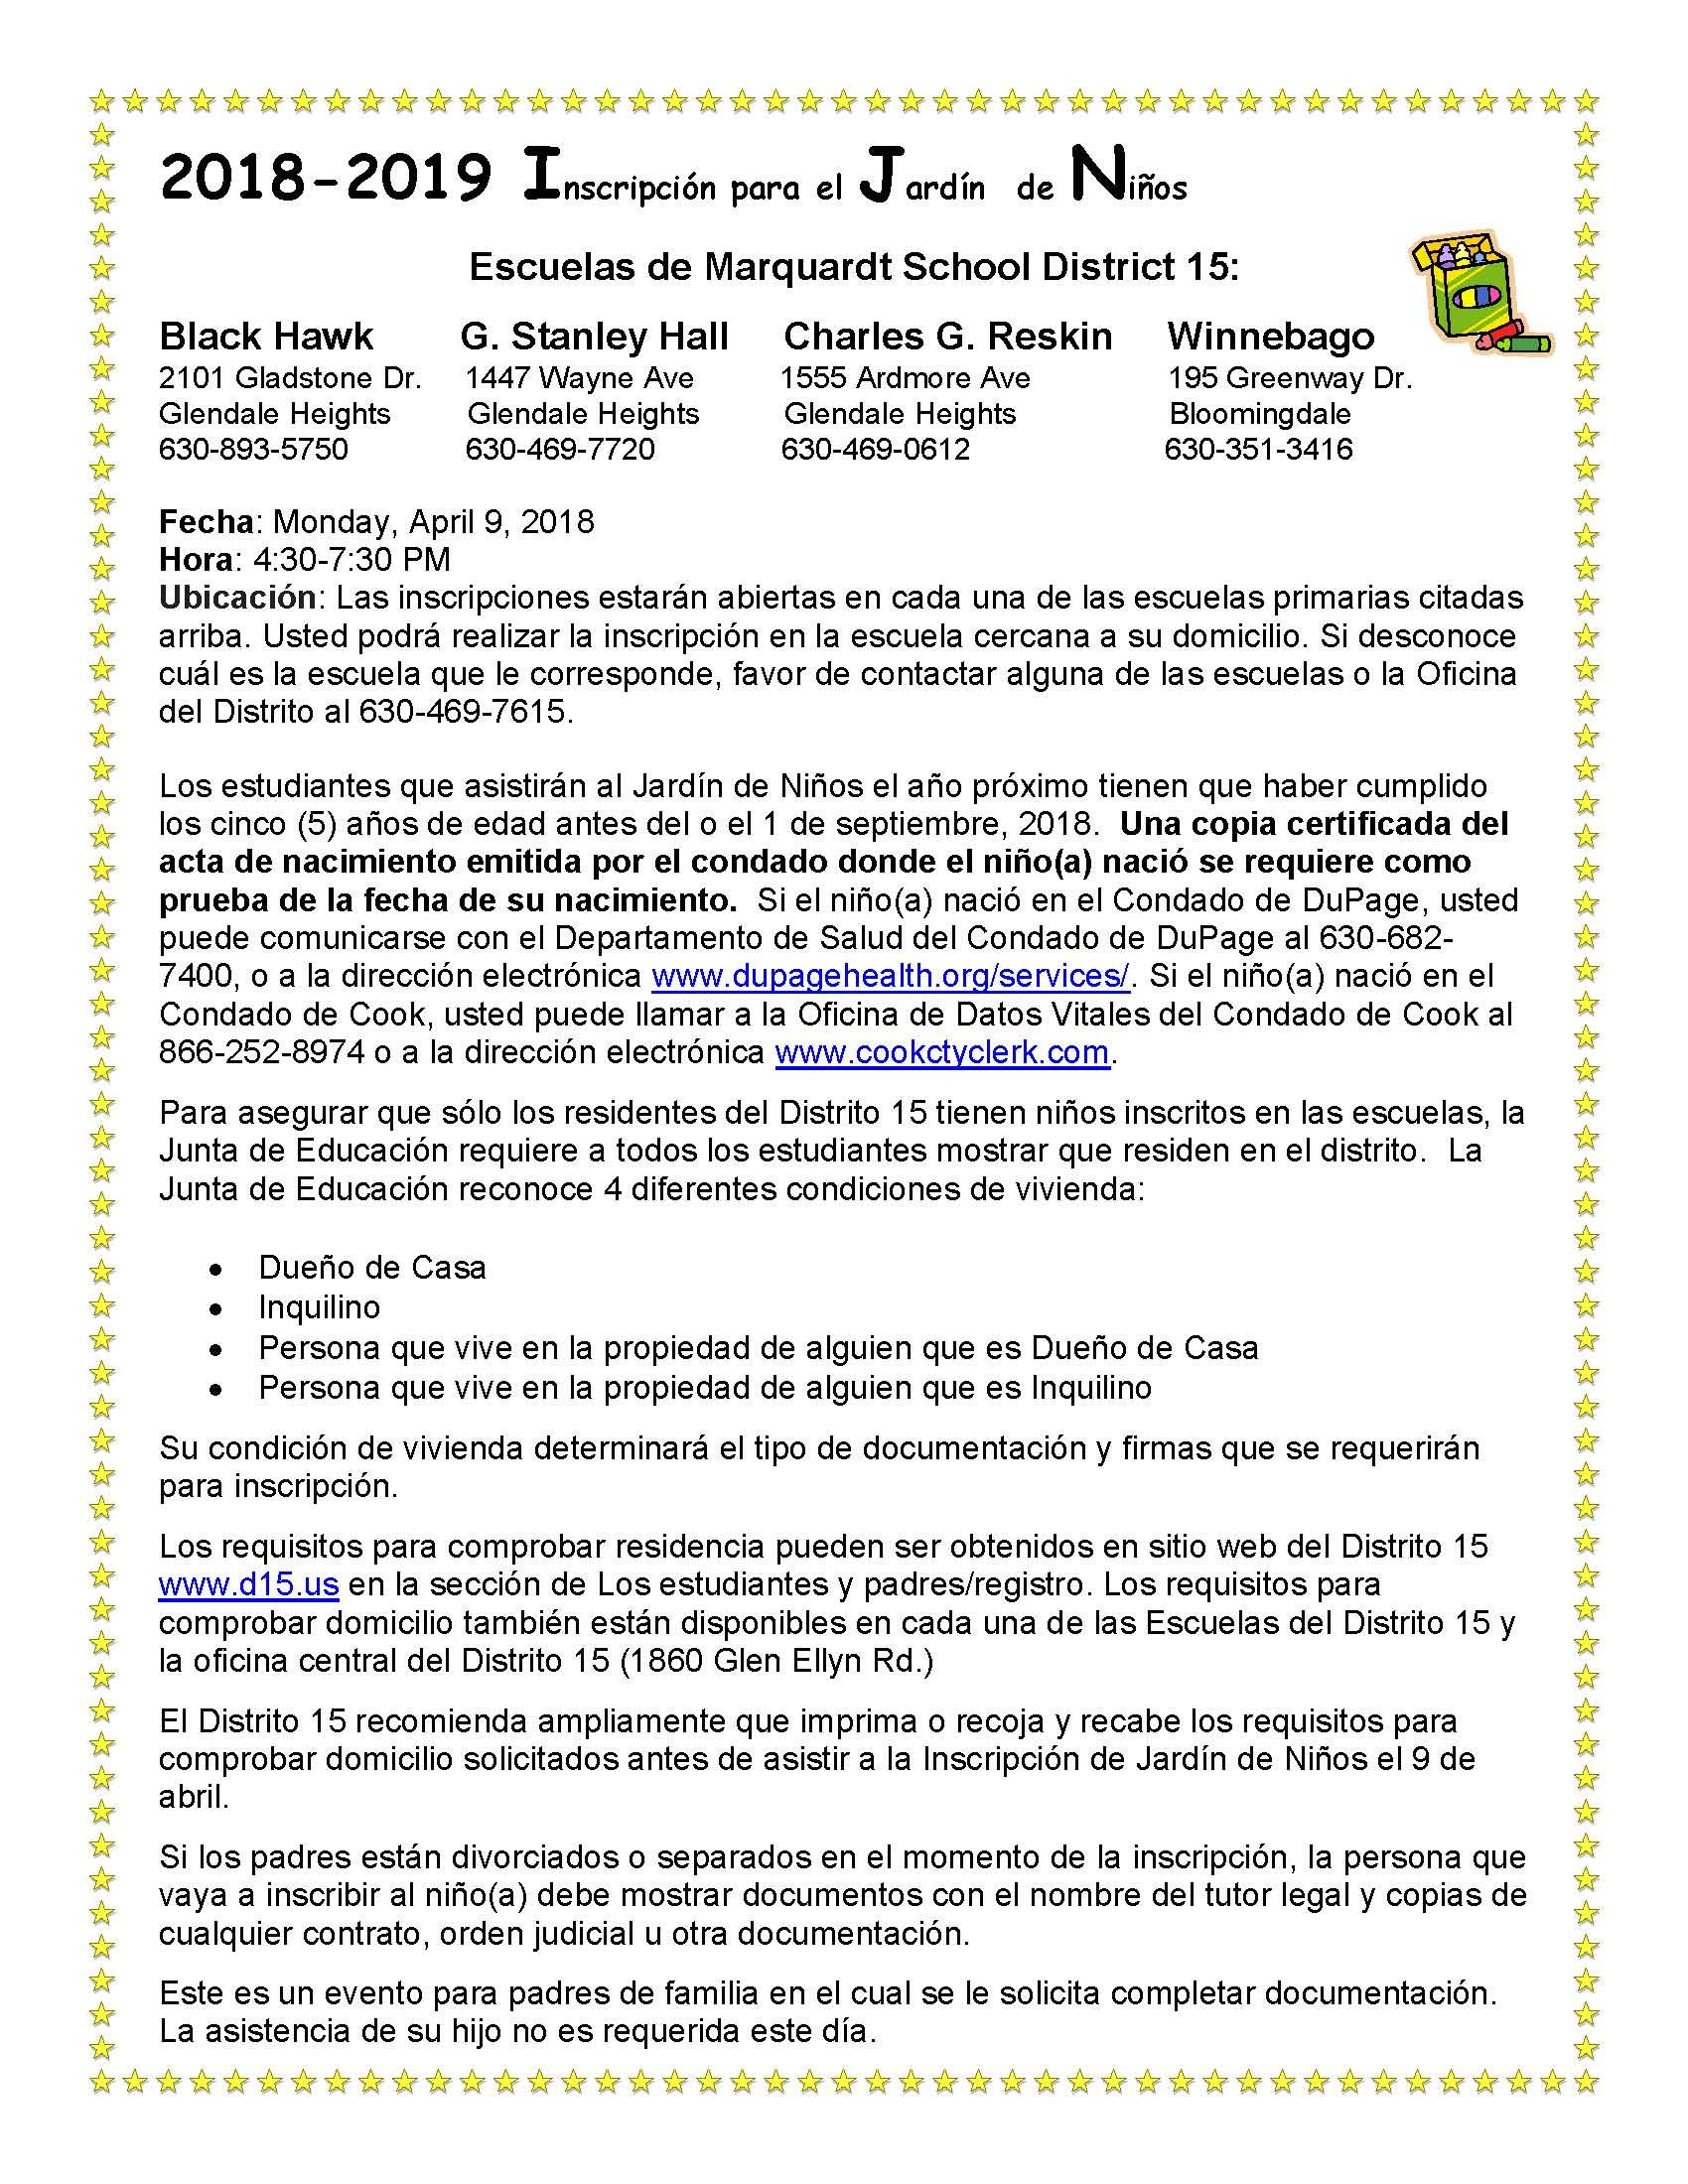 Kindergarten Flyer 2018-2019_Page_2.jpg